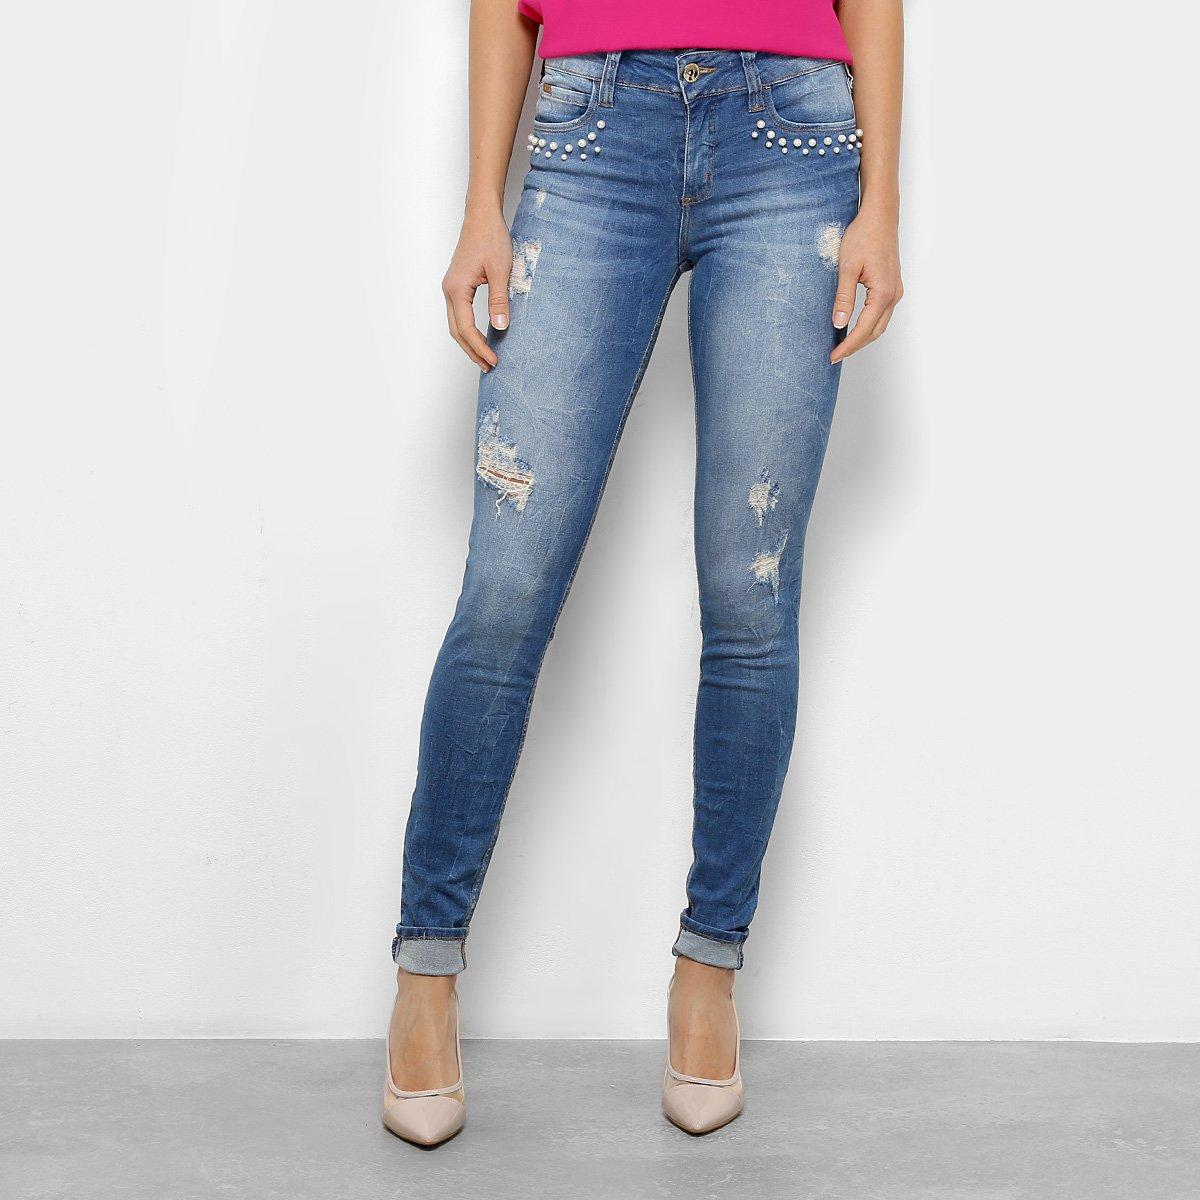 cb734b368 Calça Jeans Skinny Colcci Fátima Rasgos Pérolas Cintura Média Feminina